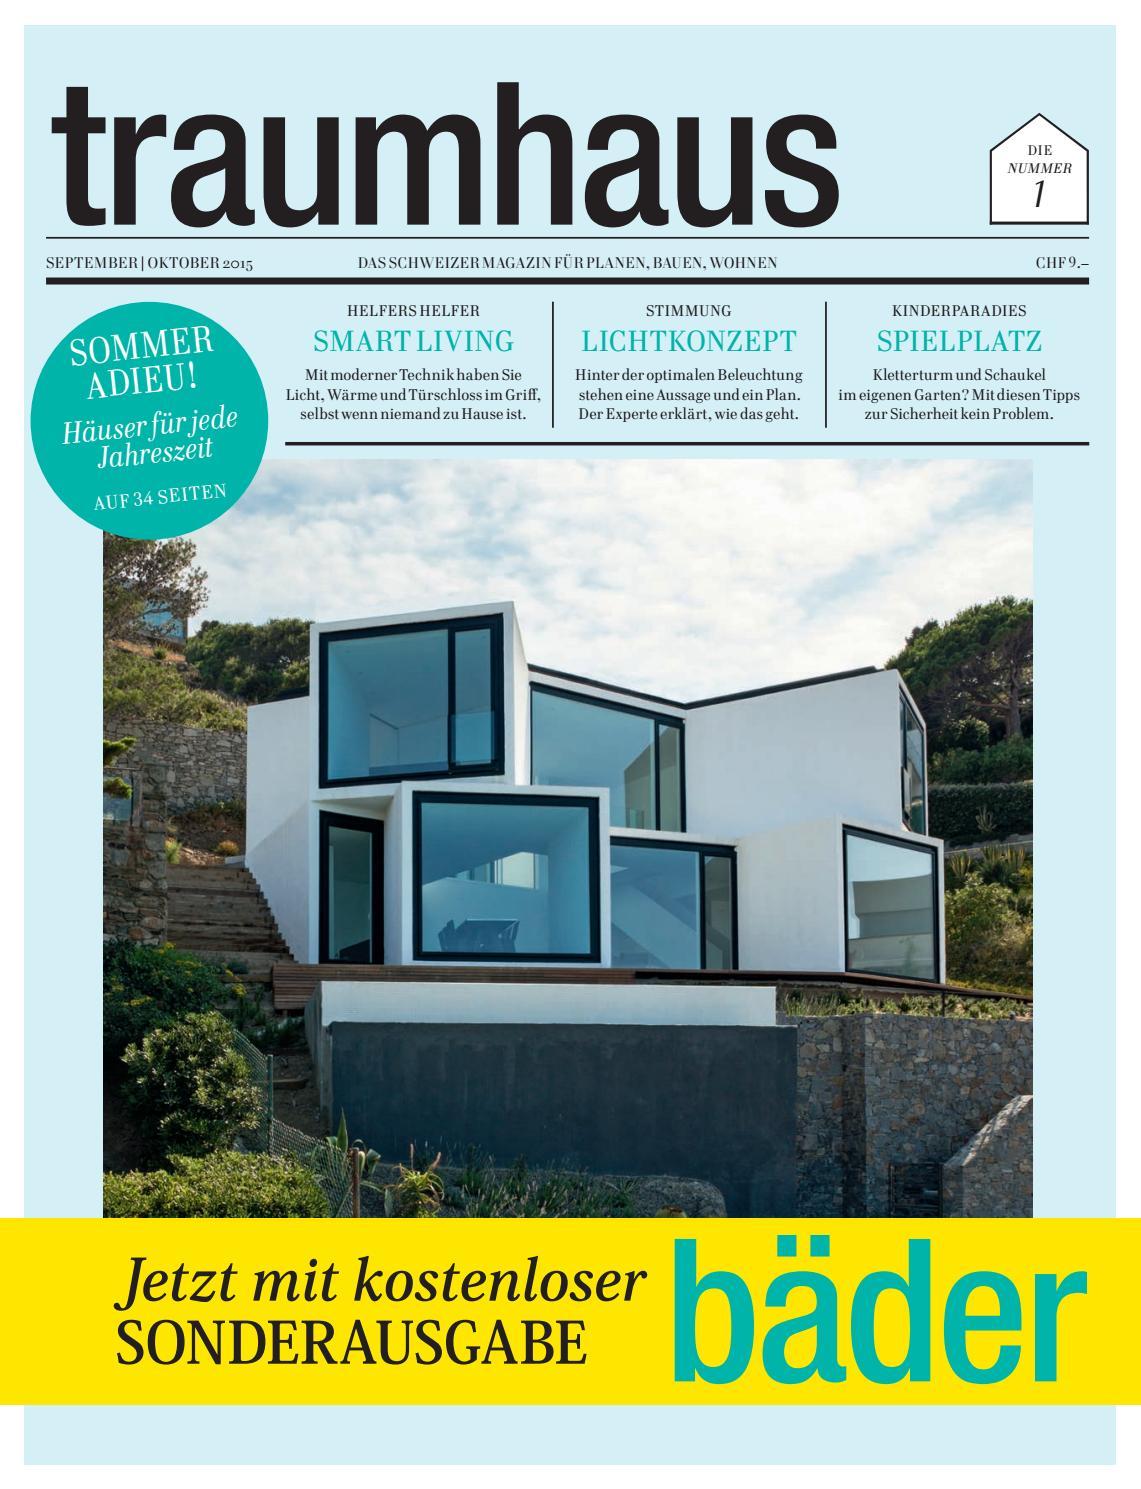 traumhaus 04 2015 by BL Verlag AG - issuu